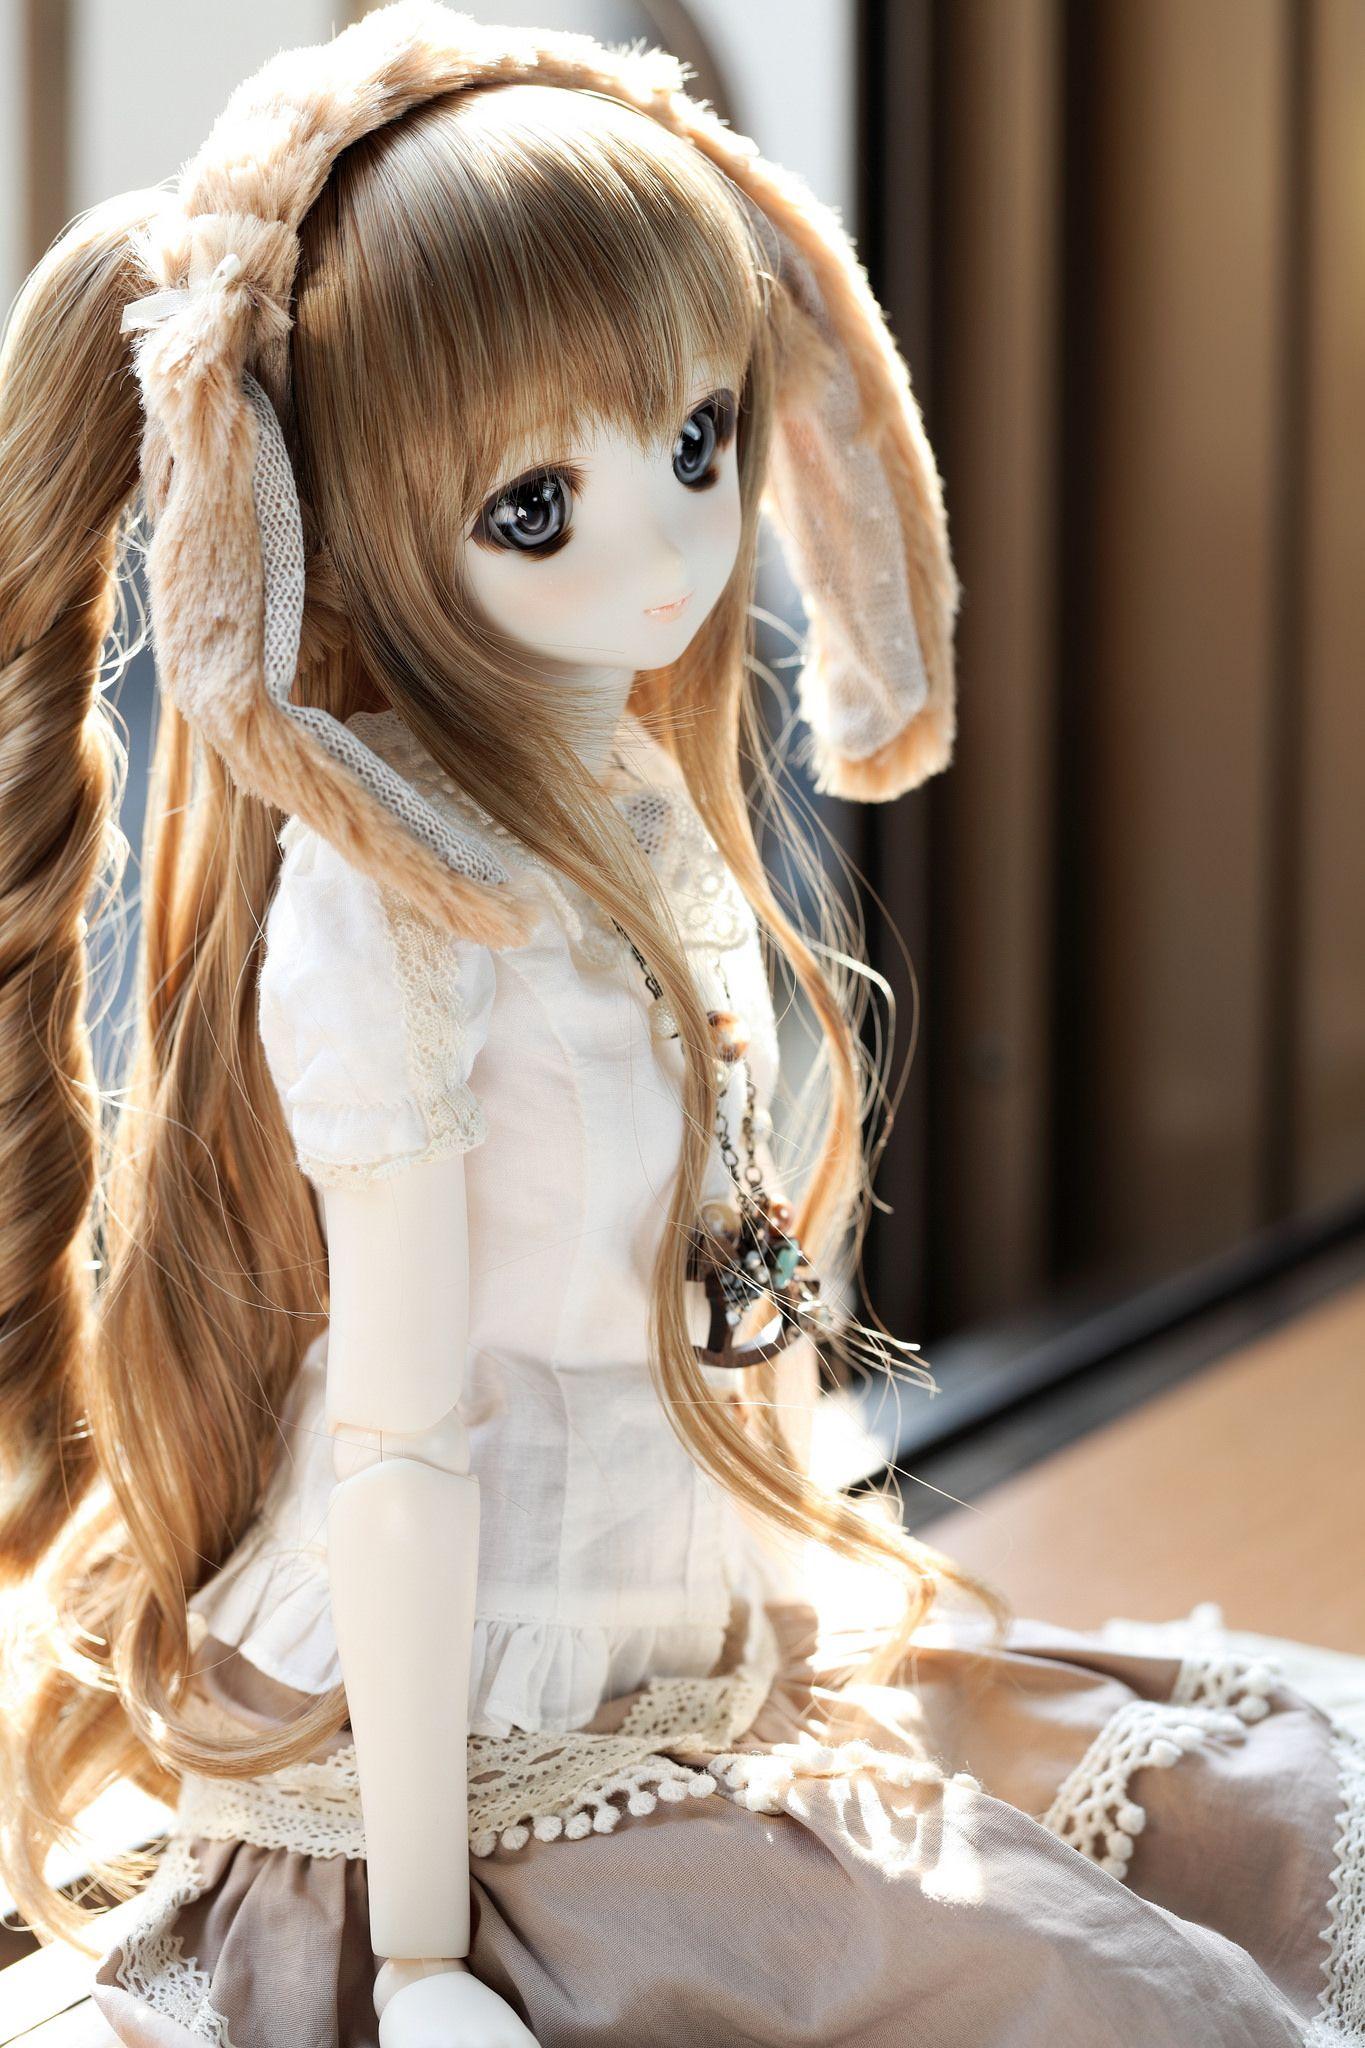 cute anime dolls for sale